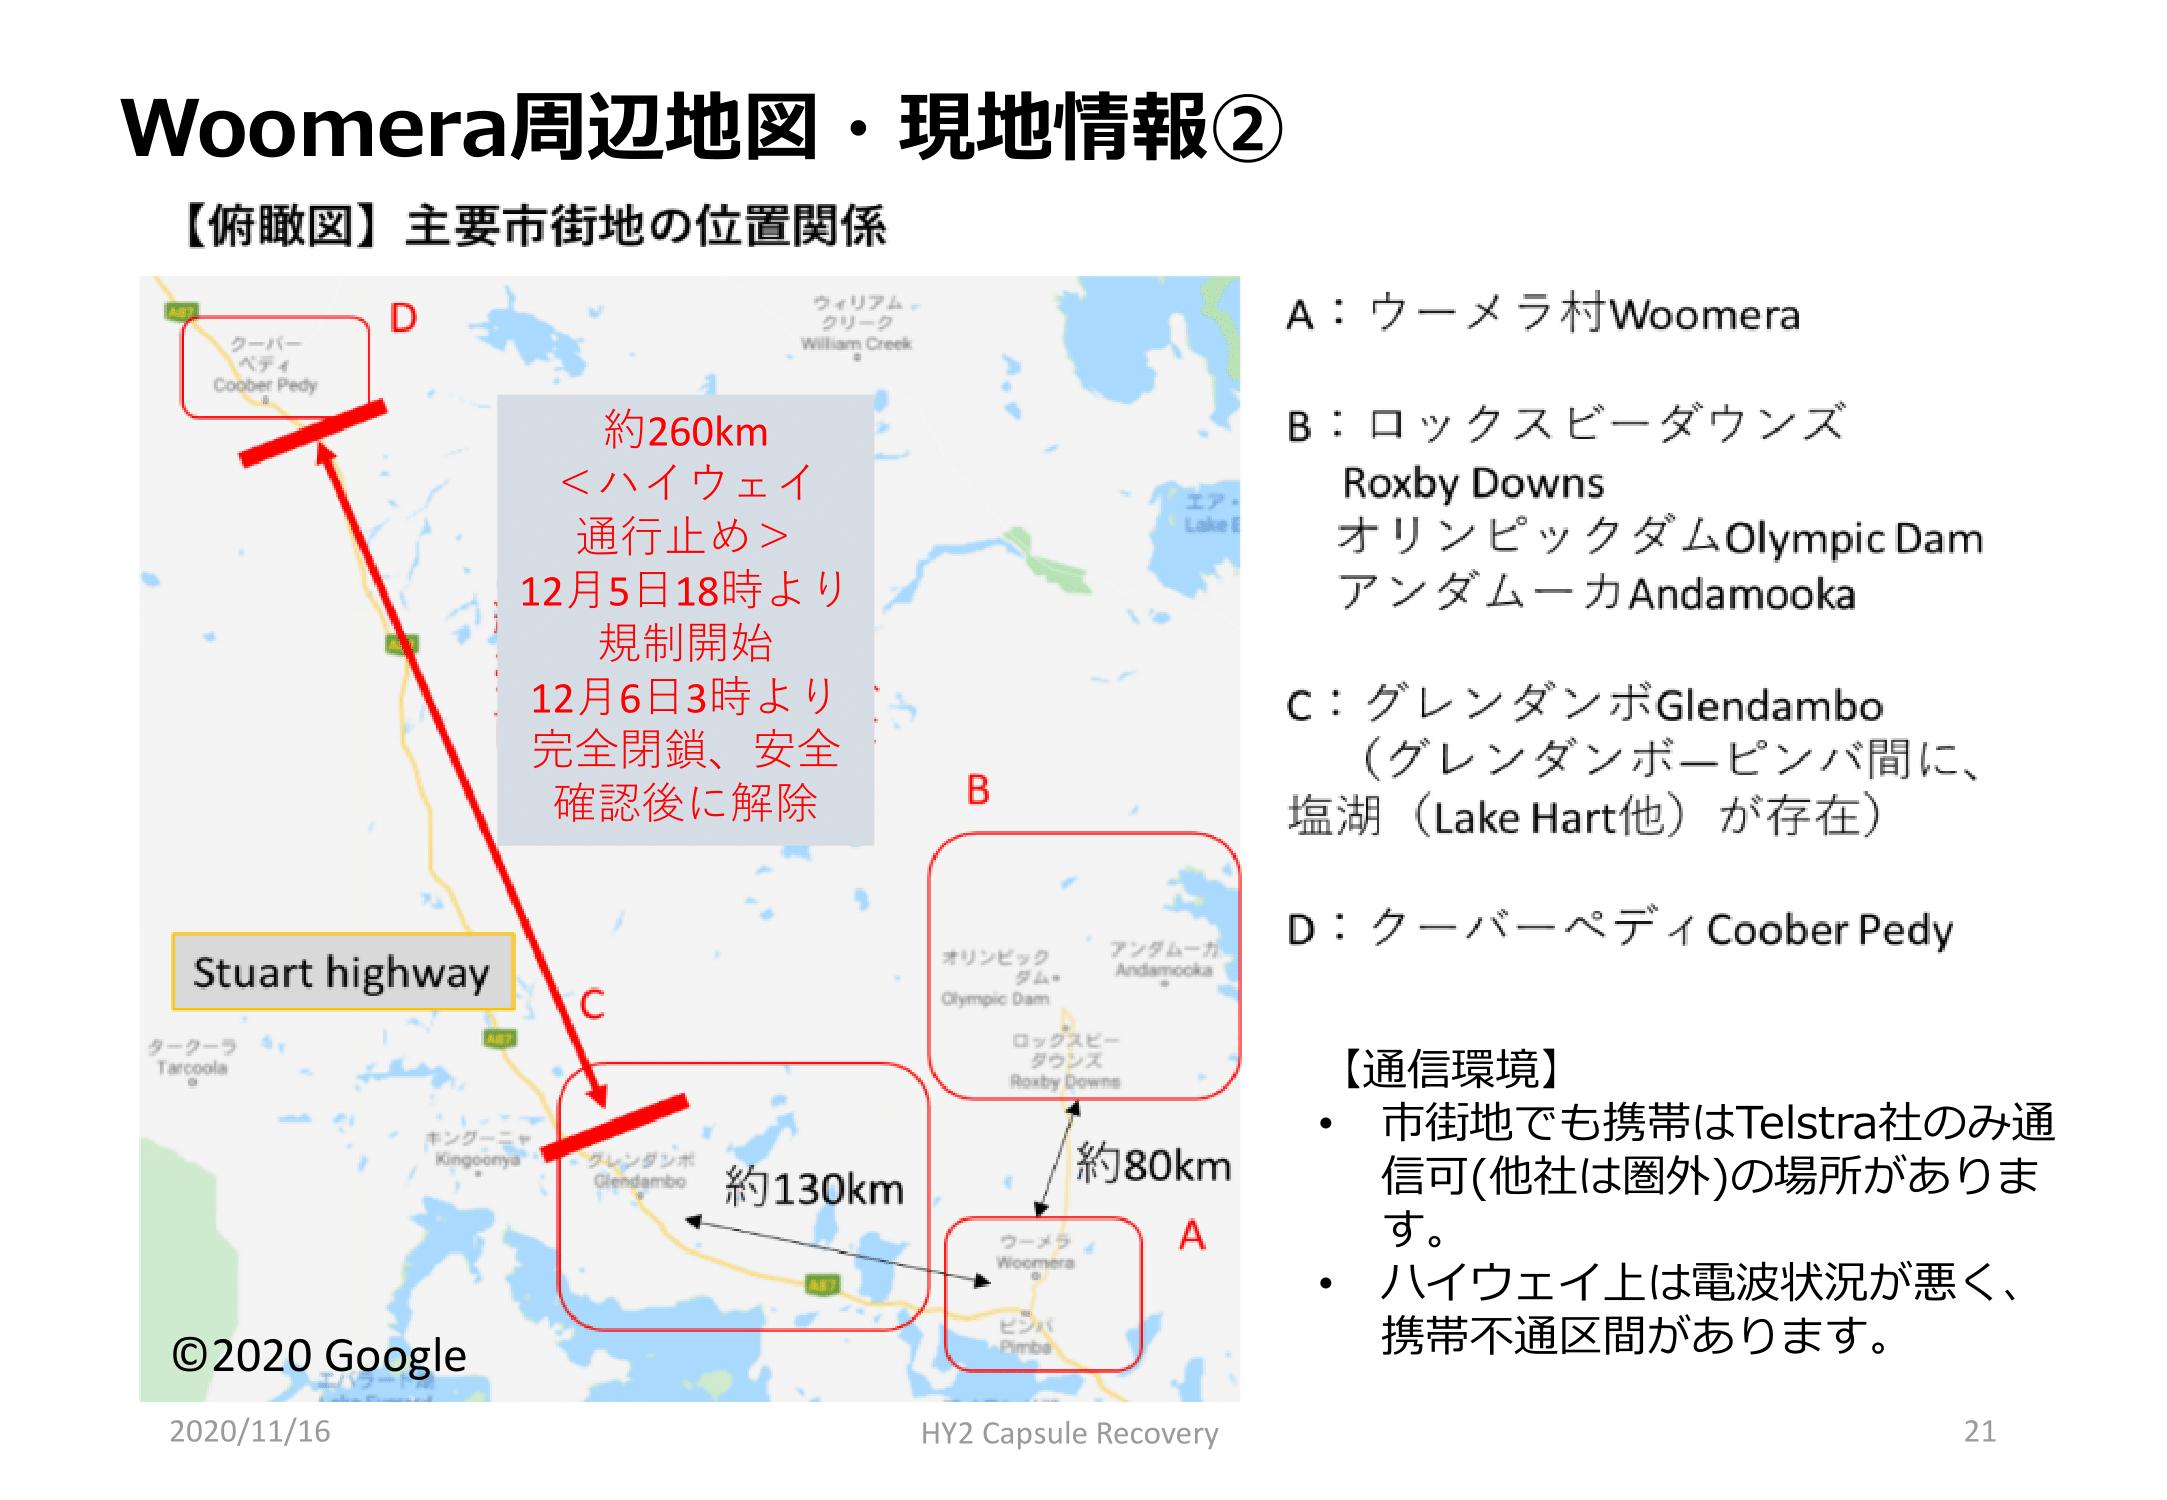 f:id:Imamura:20201117222428p:plain